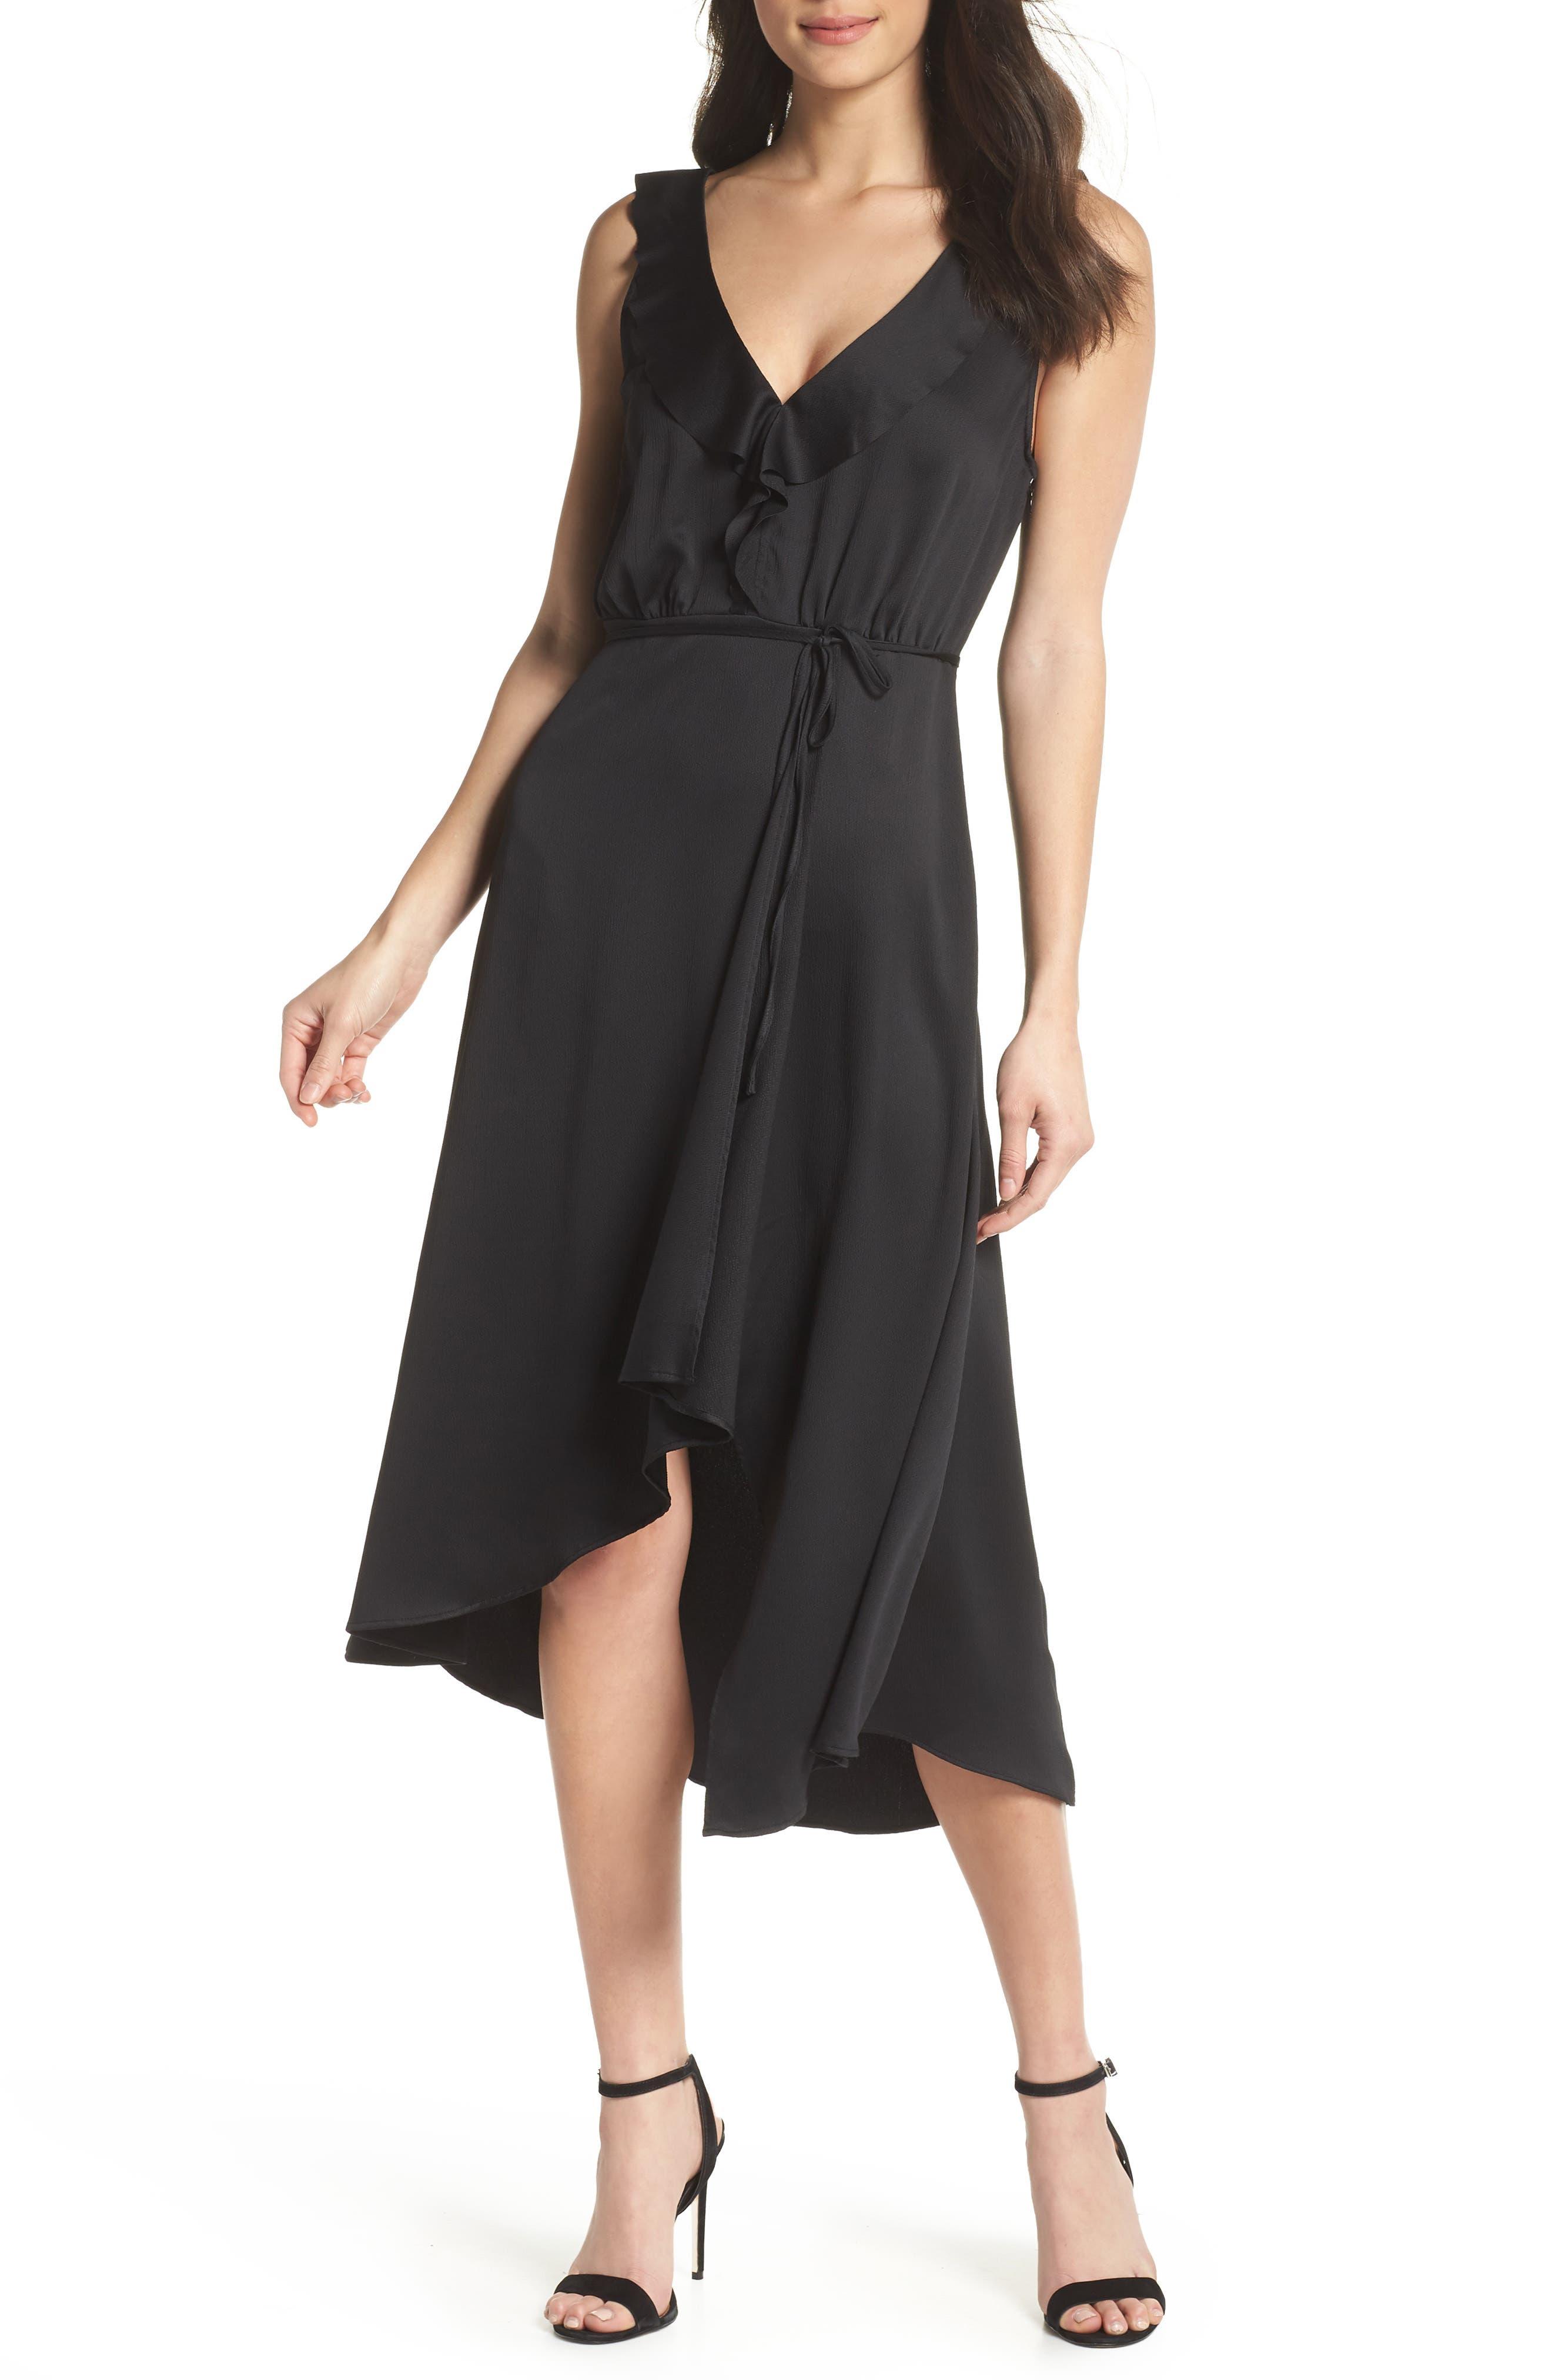 Maudie Ruffle Midi Dress,                         Main,                         color, Black